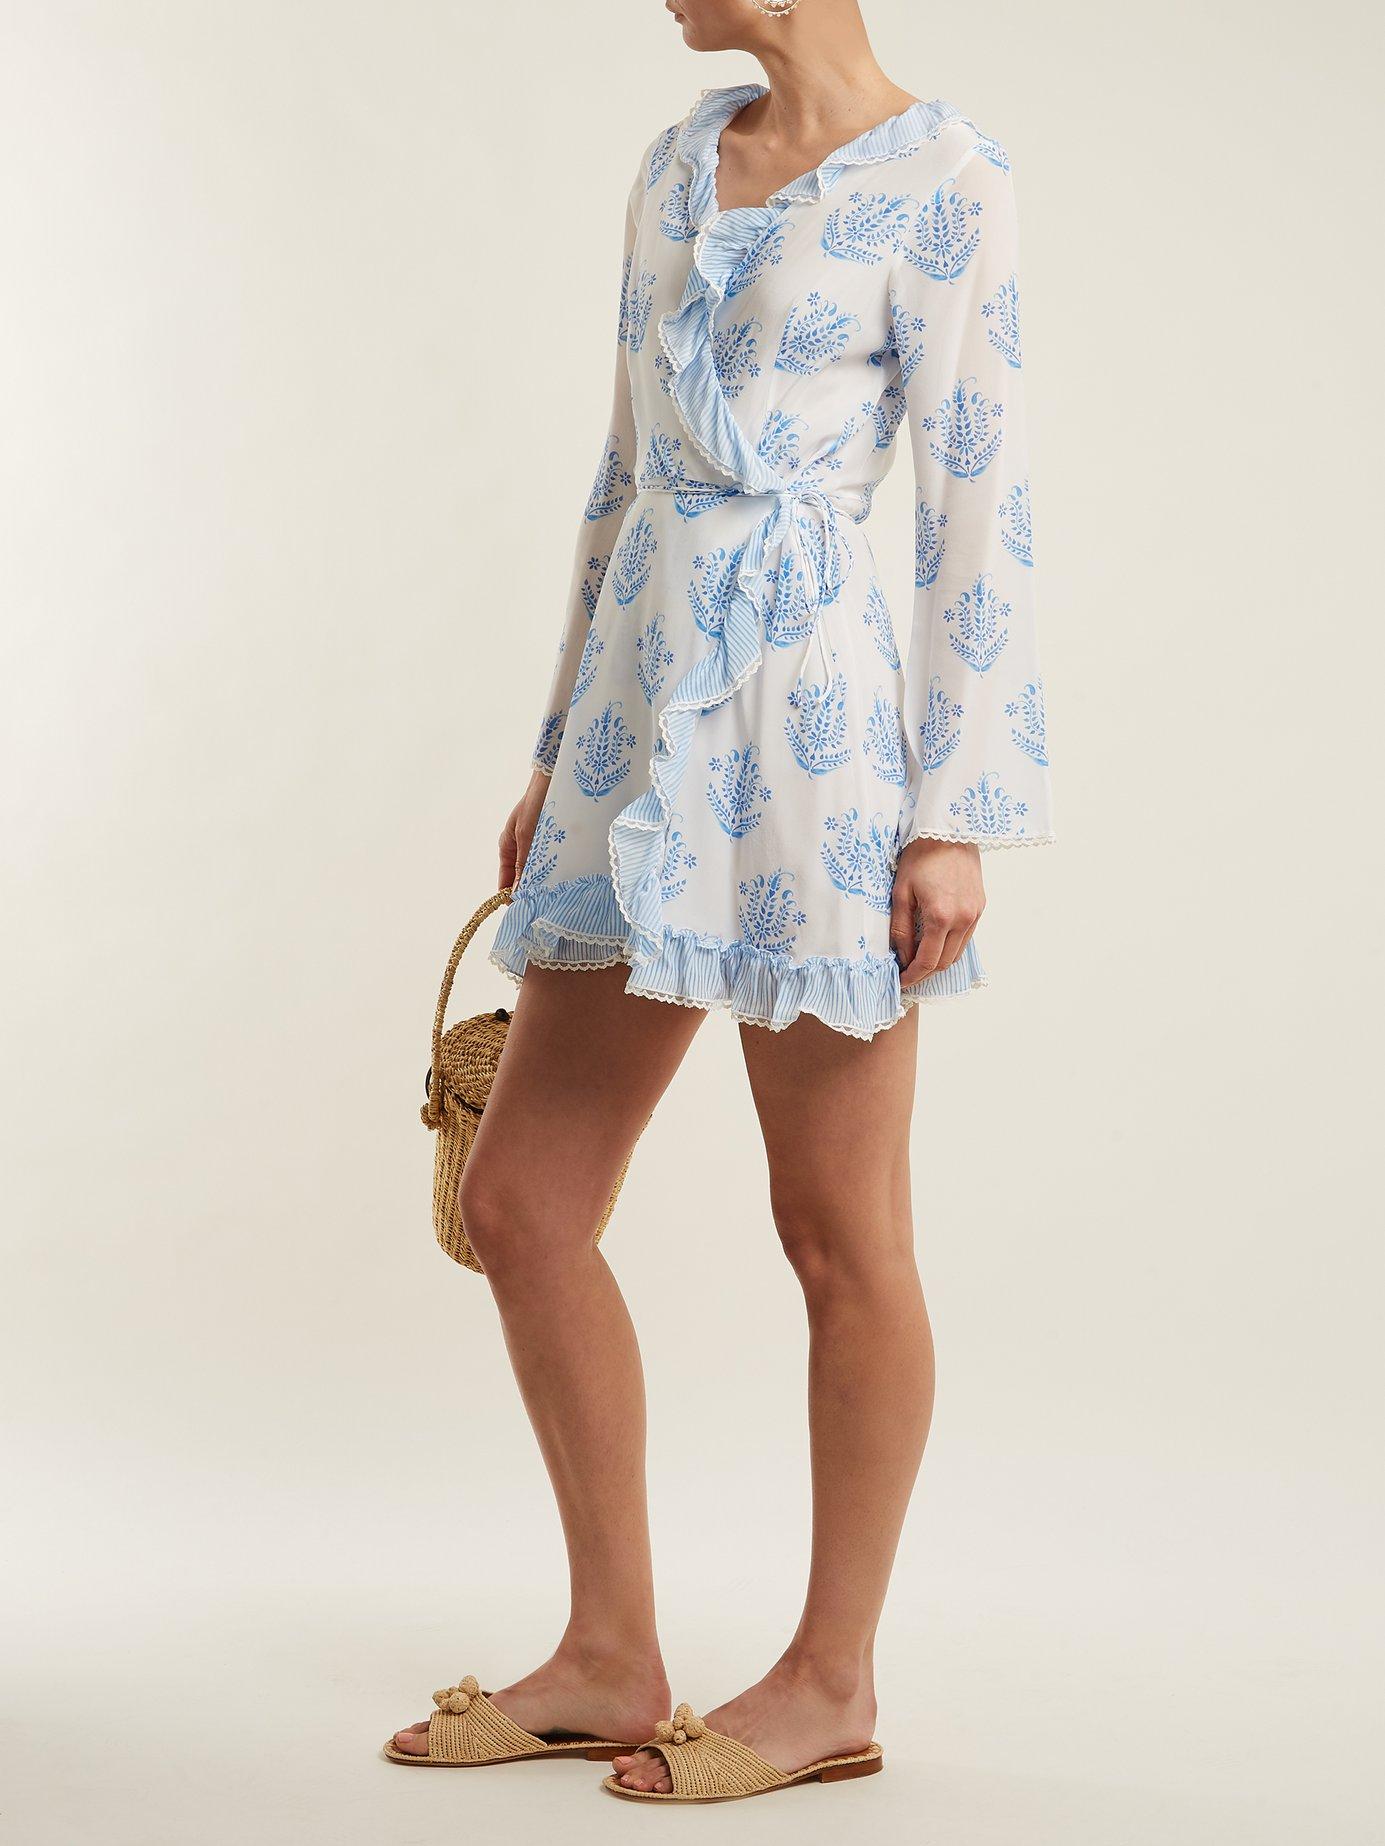 Vagabond long-sleeve wrap dress by Athena Procopiou